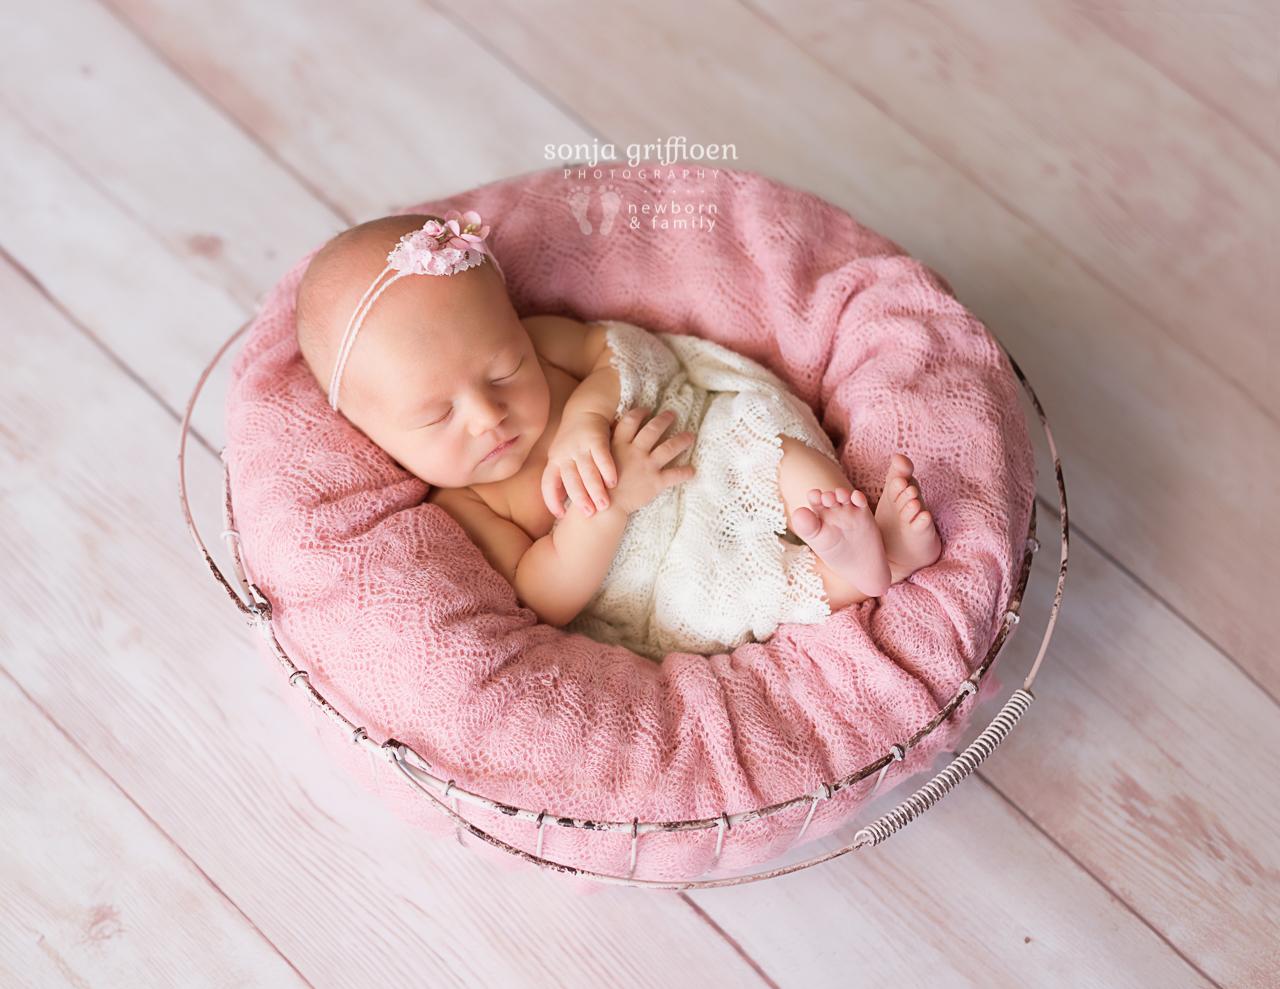 Amelia-Newborn-Brisbane-Newborn-Photographer-Sonja-Griffioen-23.jpg